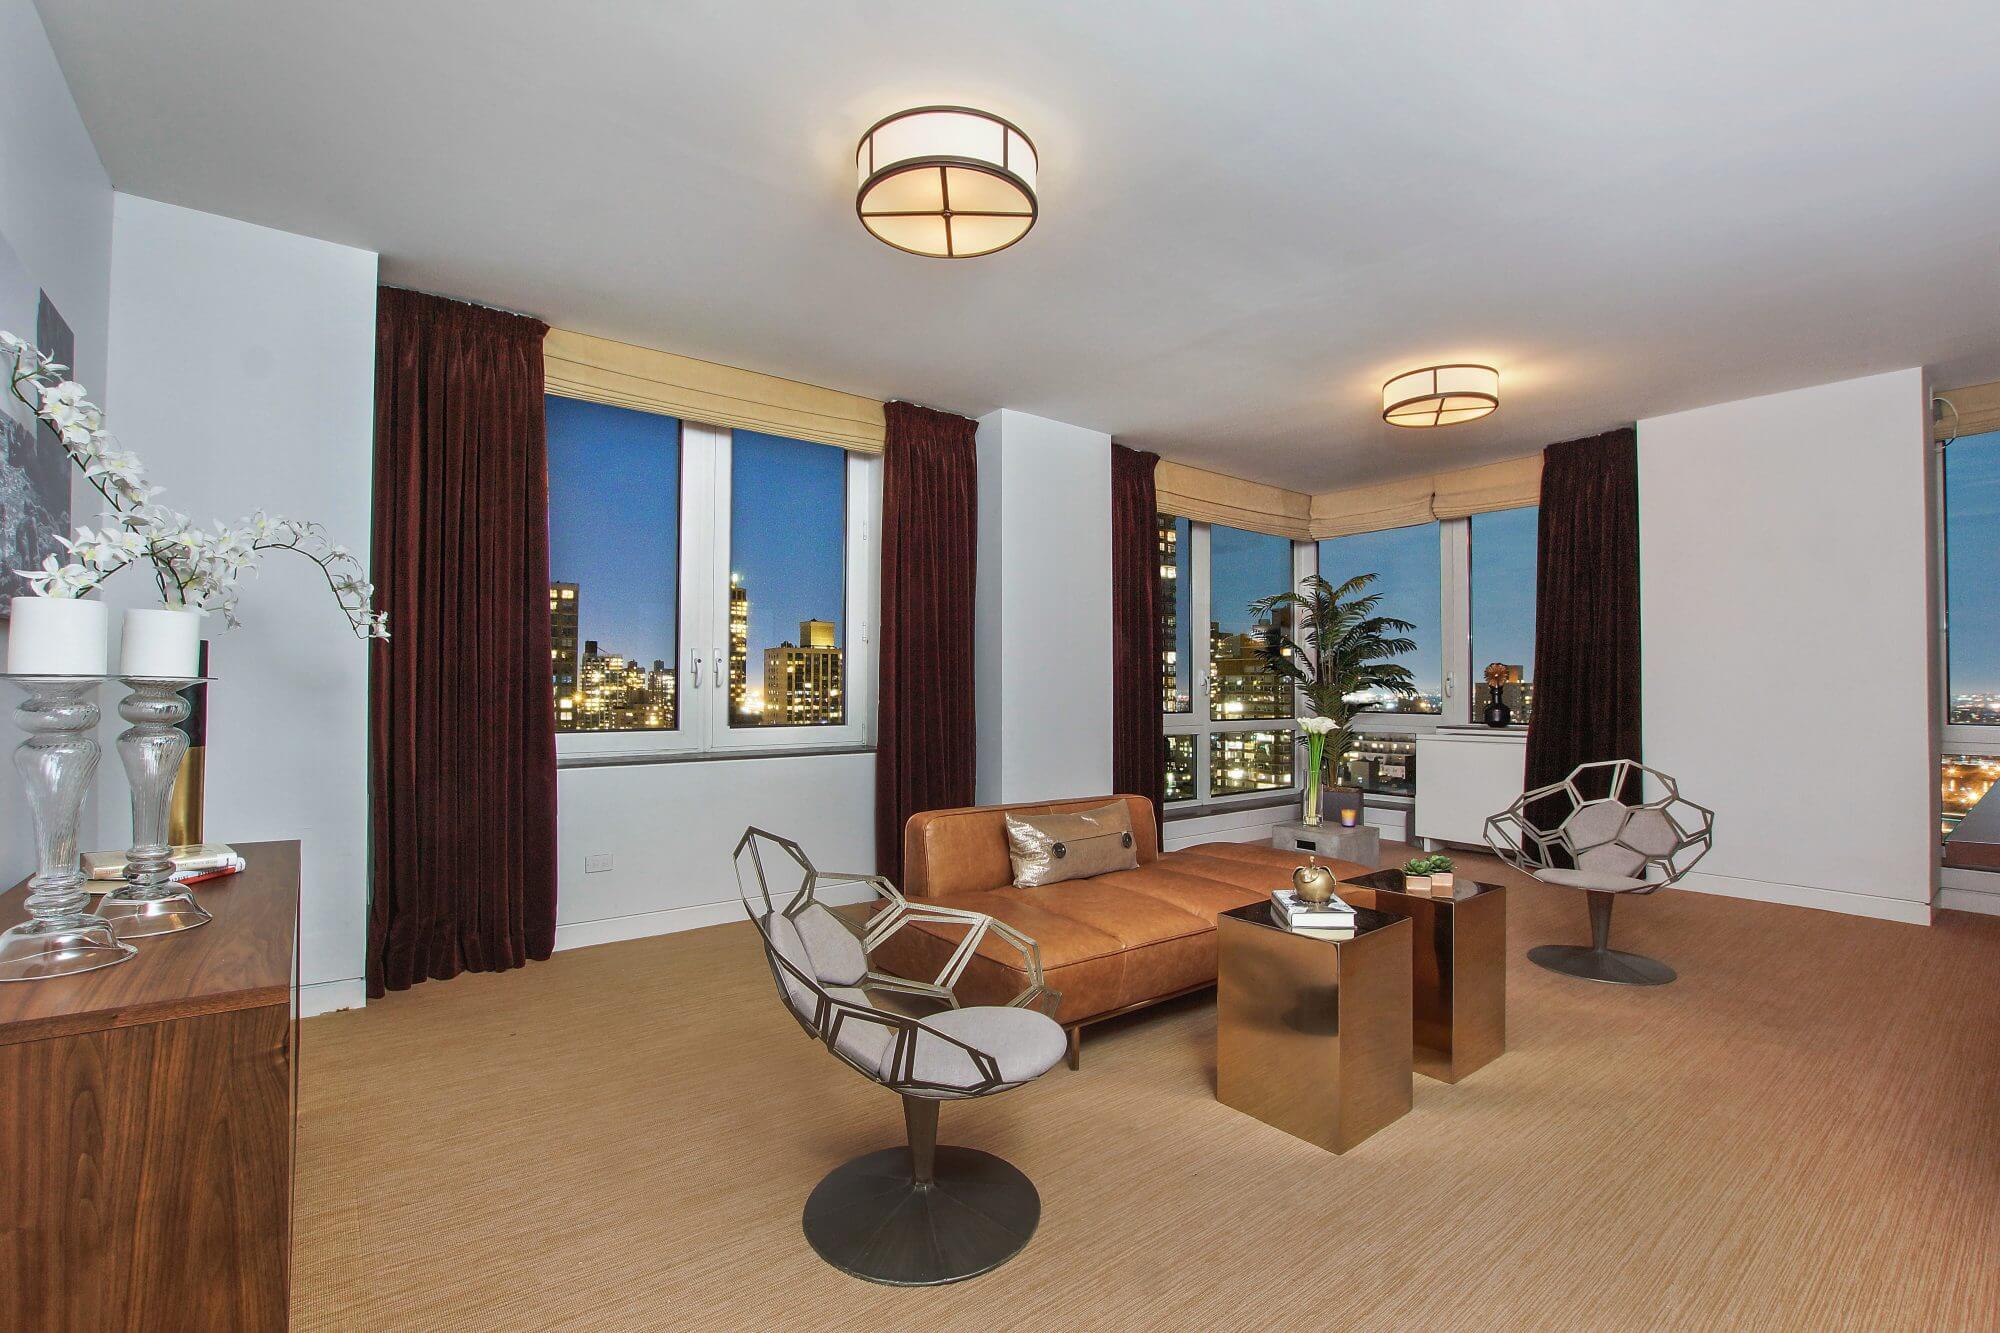 300 East 77th Street Apt. 27/28B - Family Room